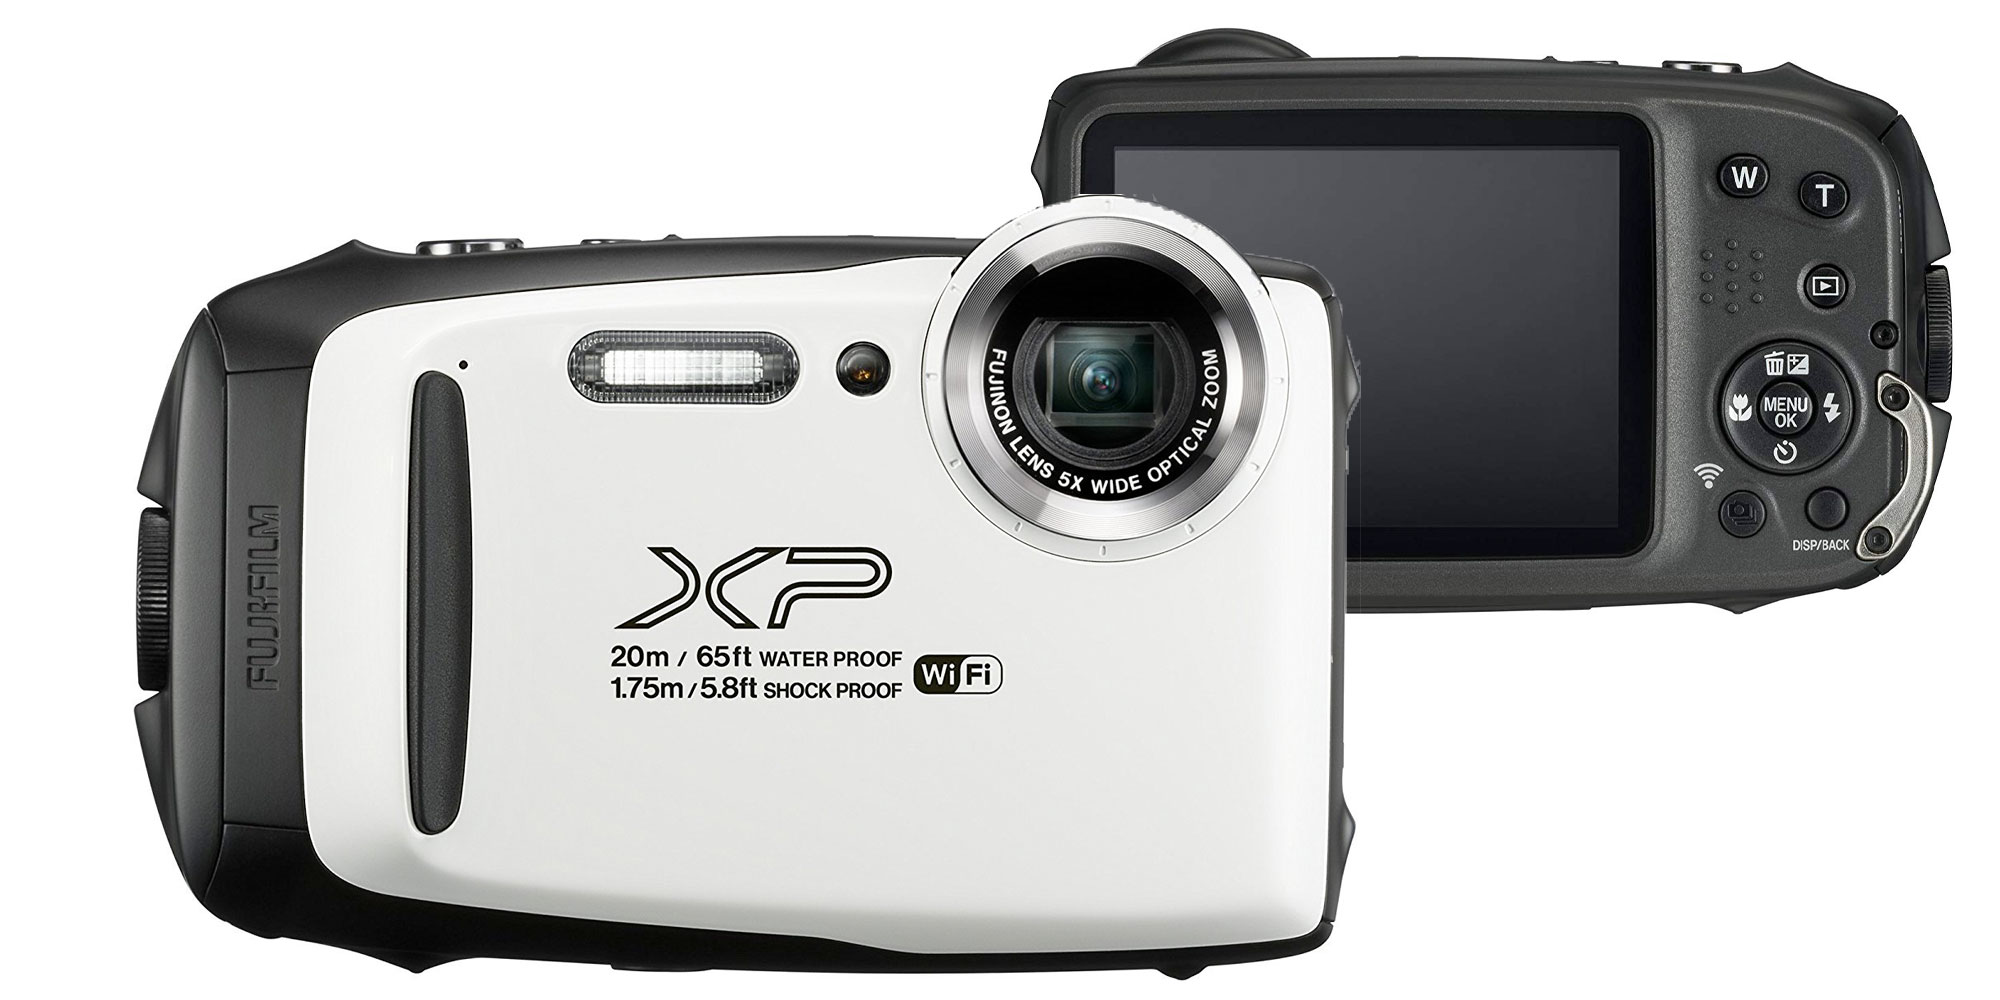 Fujifilm's FinePix waterproof camera offers 5x zoom & 1080p recording for $79 (Refurb, Orig. $180)